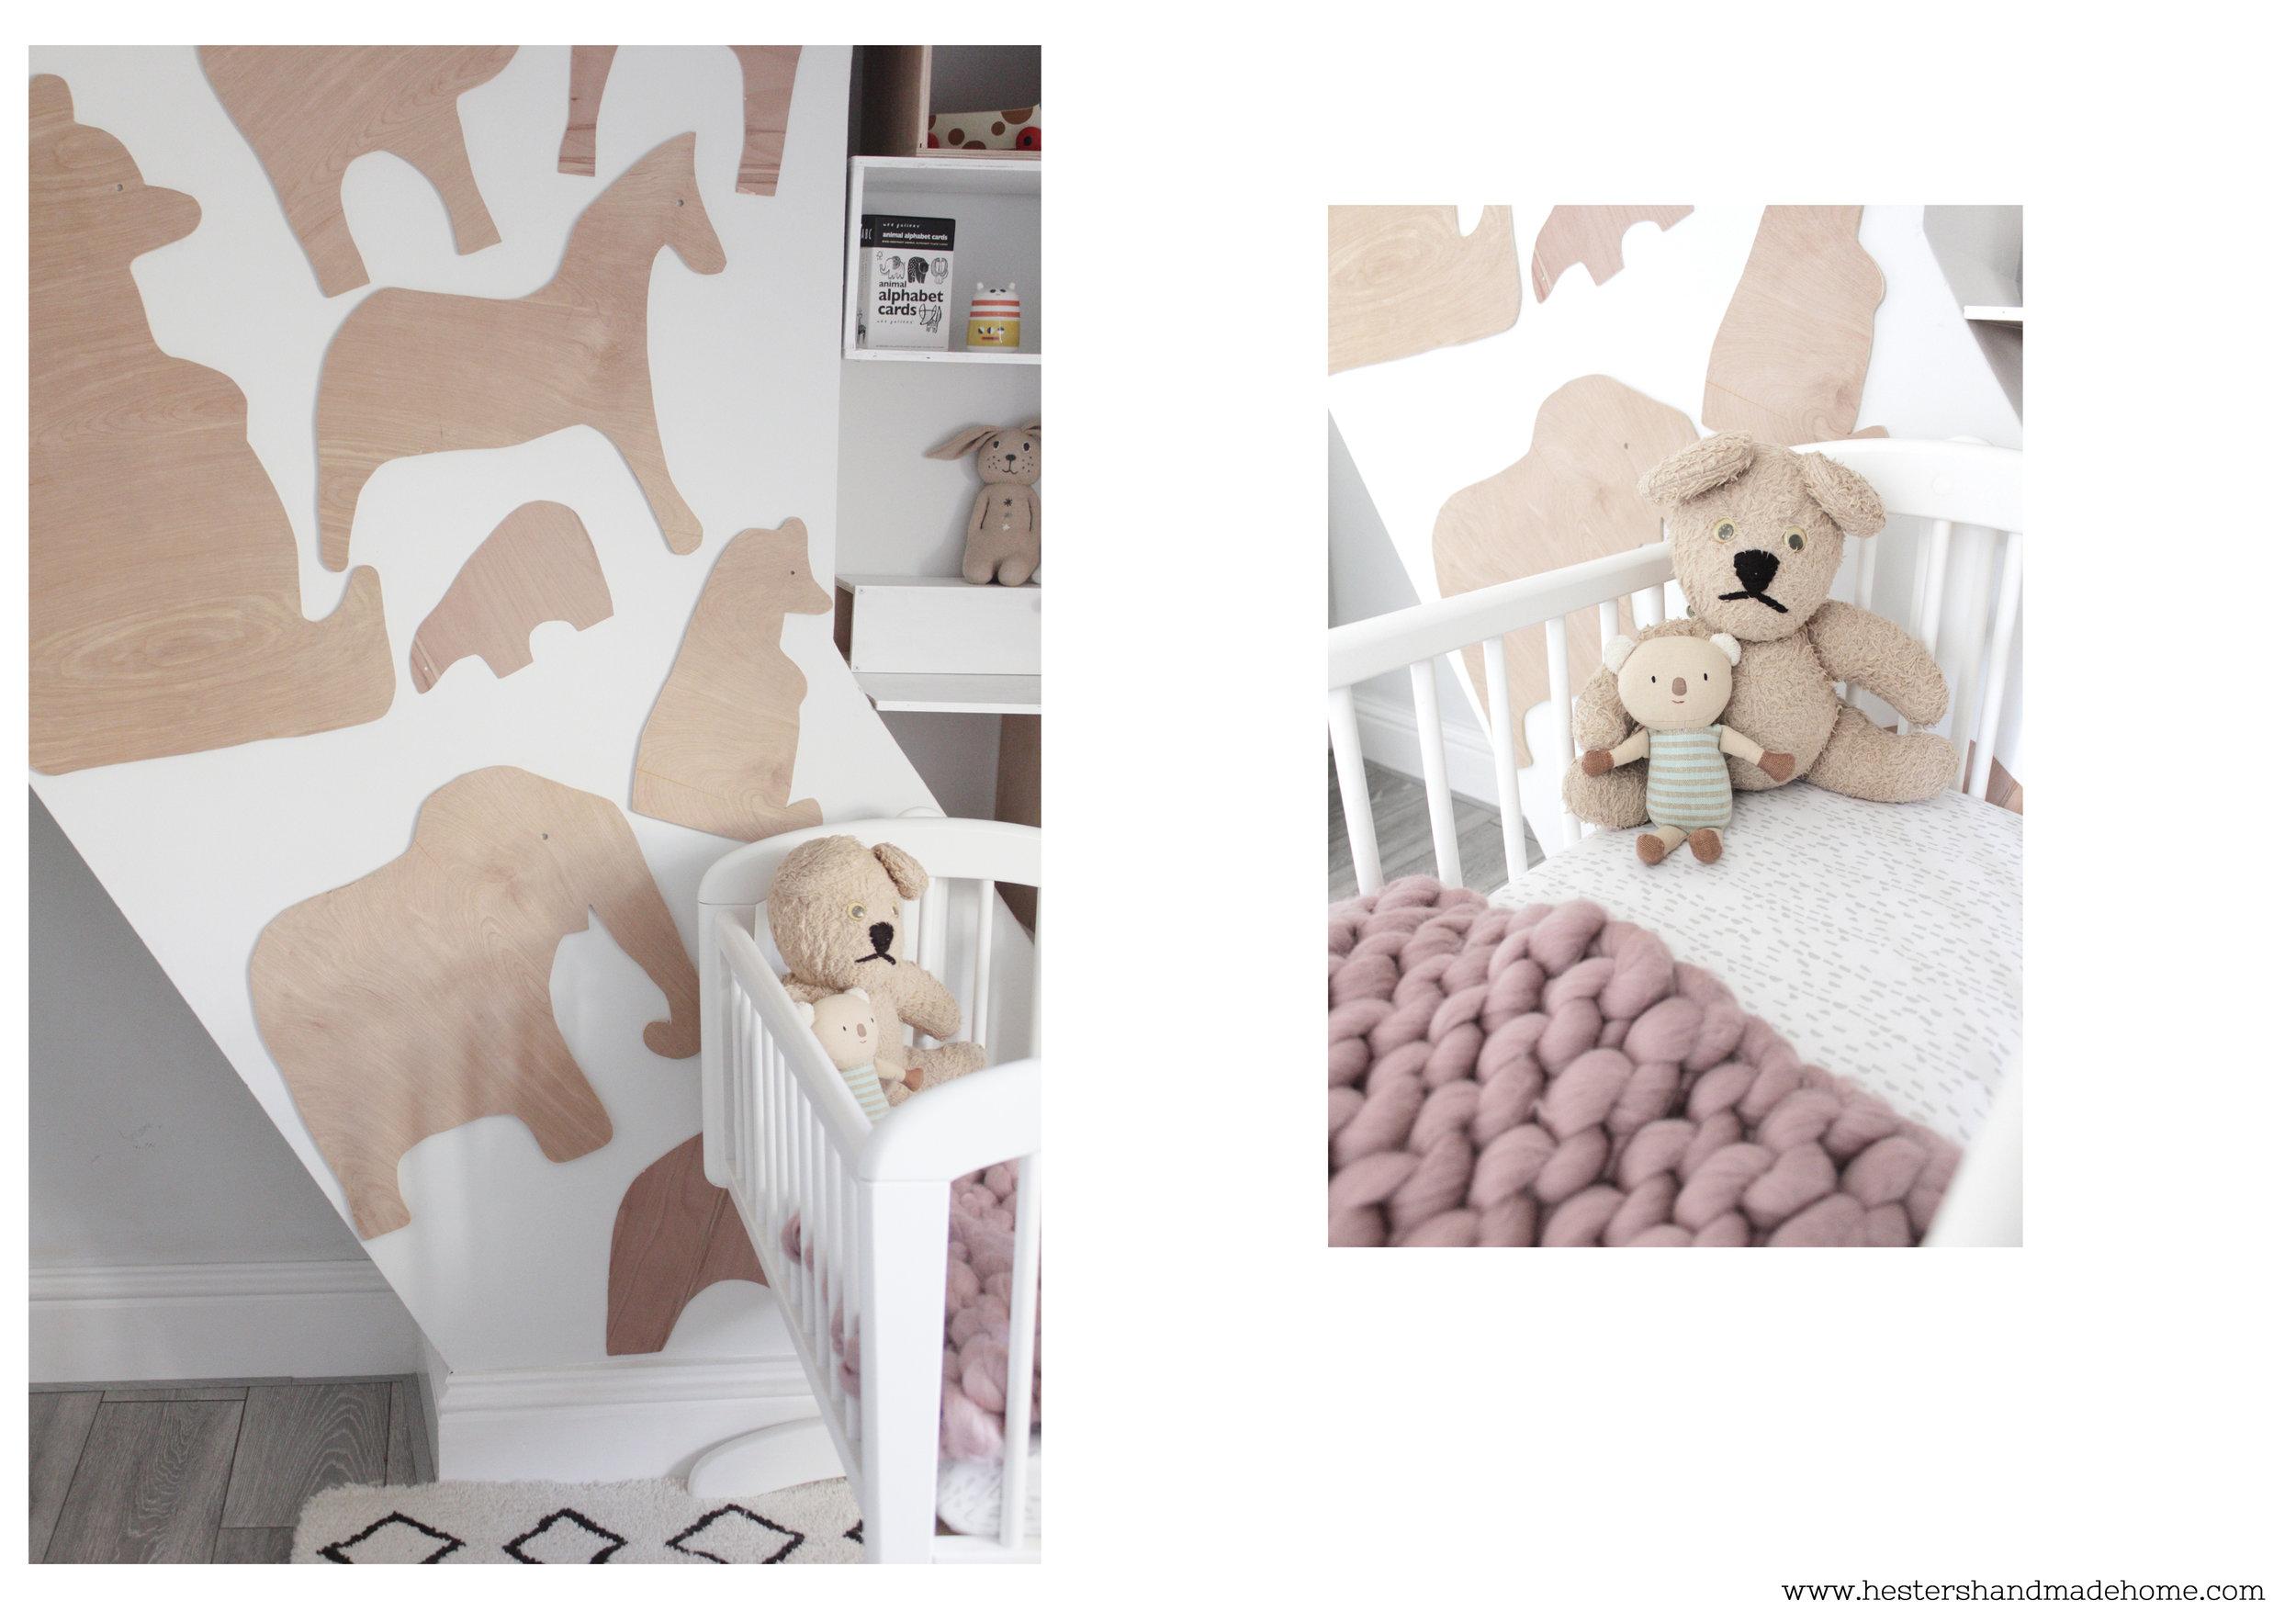 Nursery reveal, plywood animal wall decoration www.hestershandmadehome.com